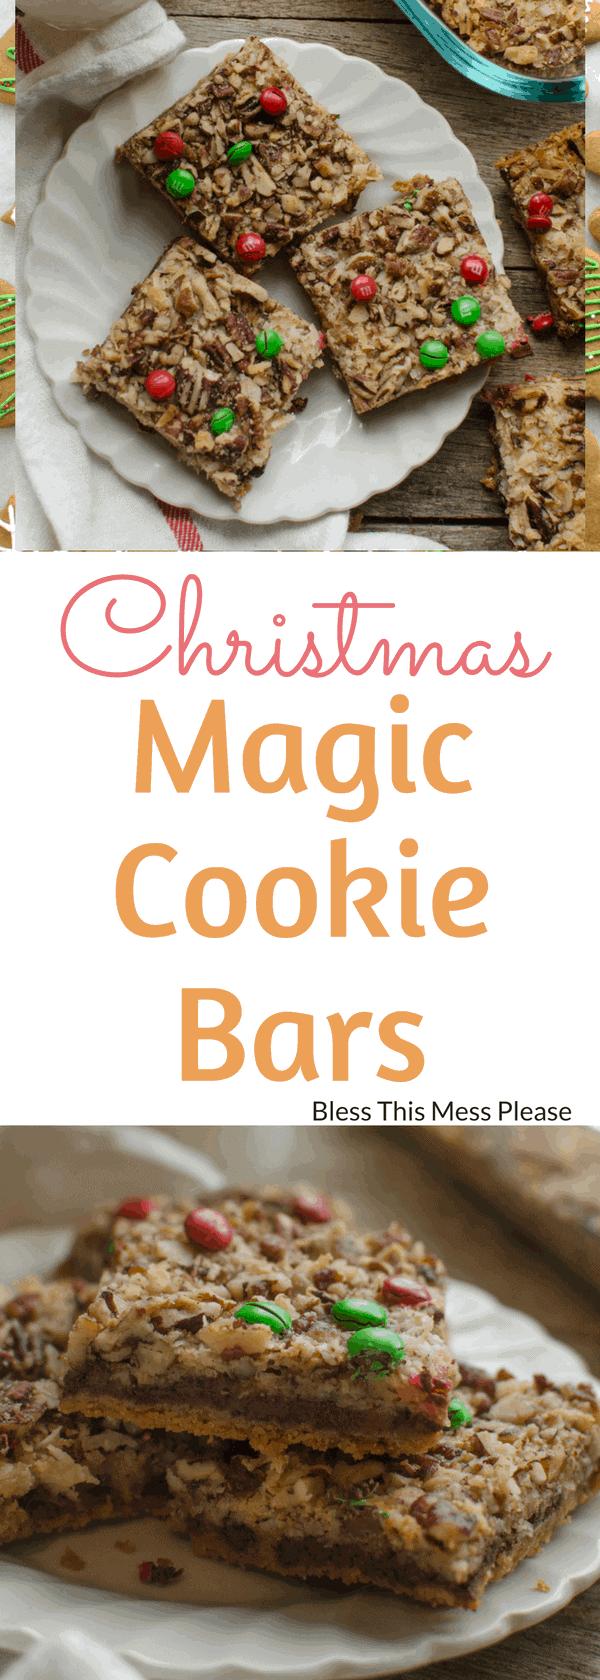 Christmas Magic Cookie Bars